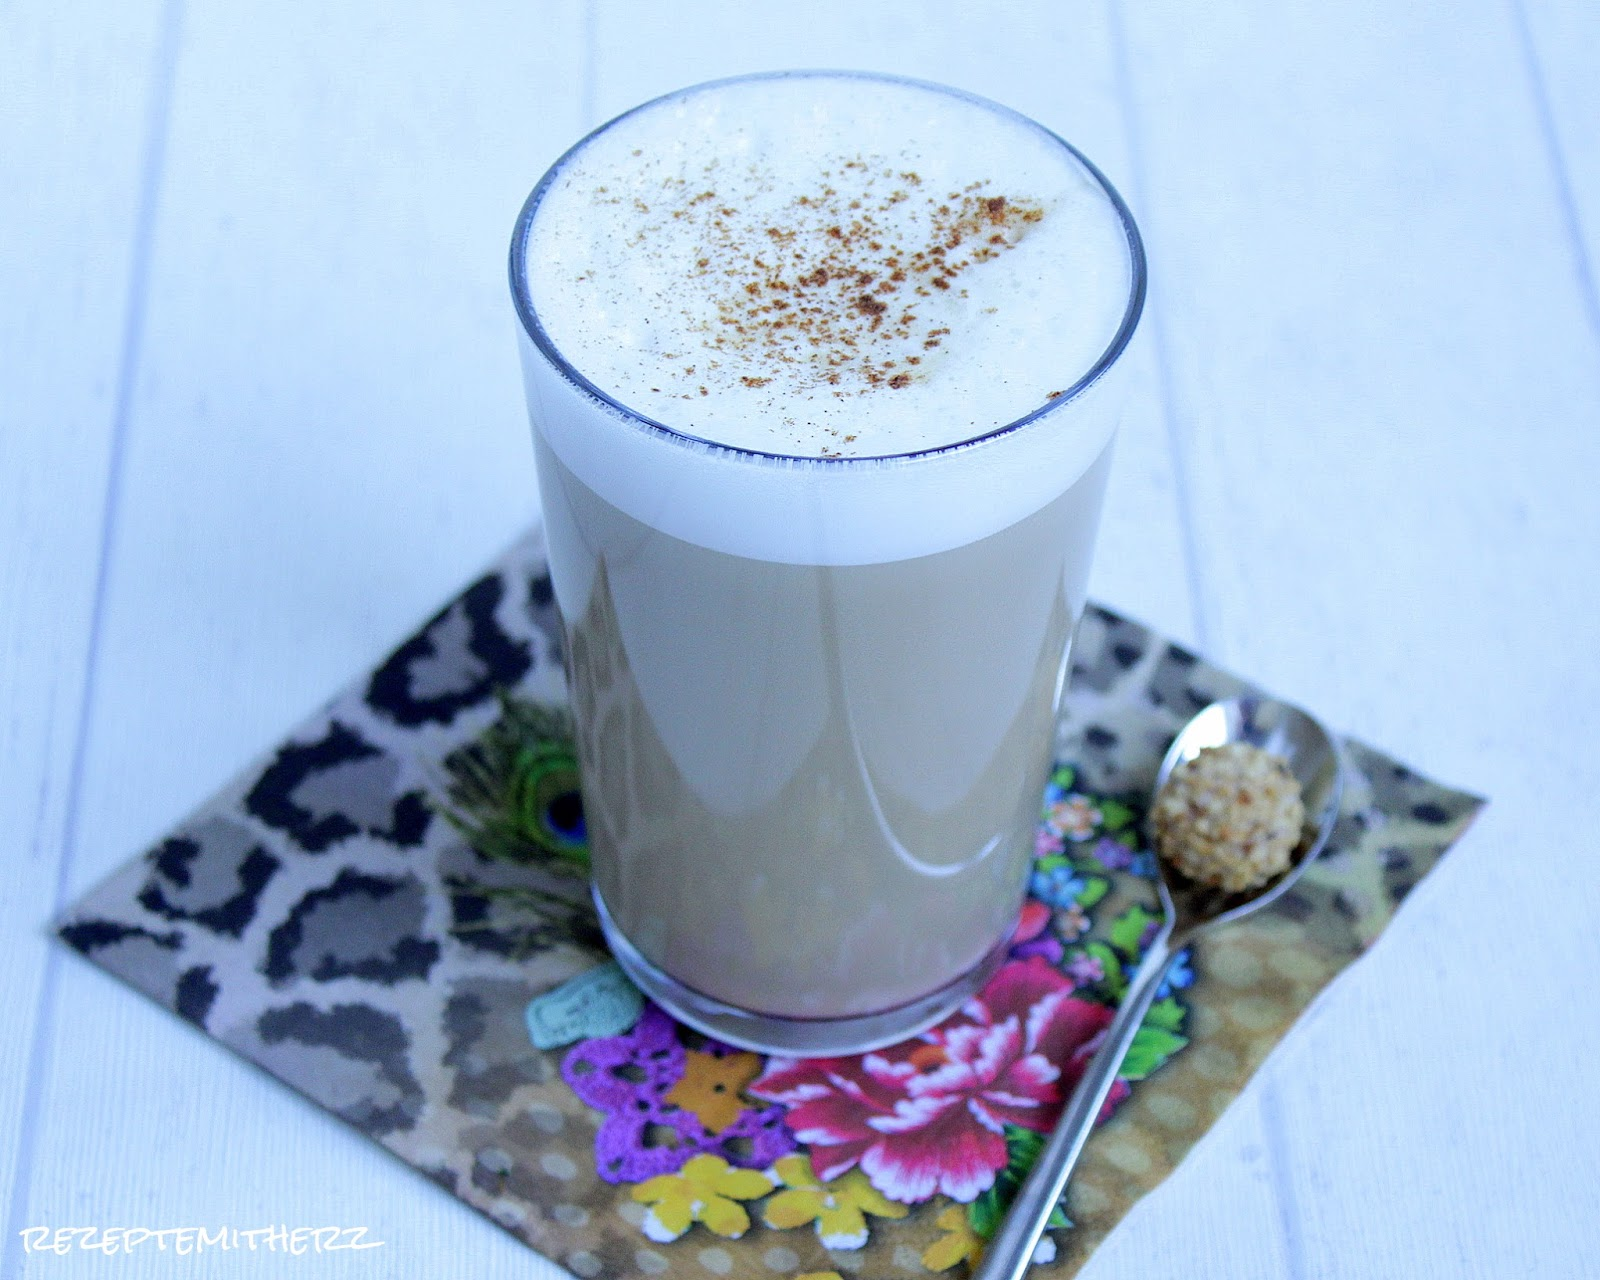 Pumpkin Spice Latte,Kaffee mit Kürbis,Thermomix Rezept, Starbucks ...